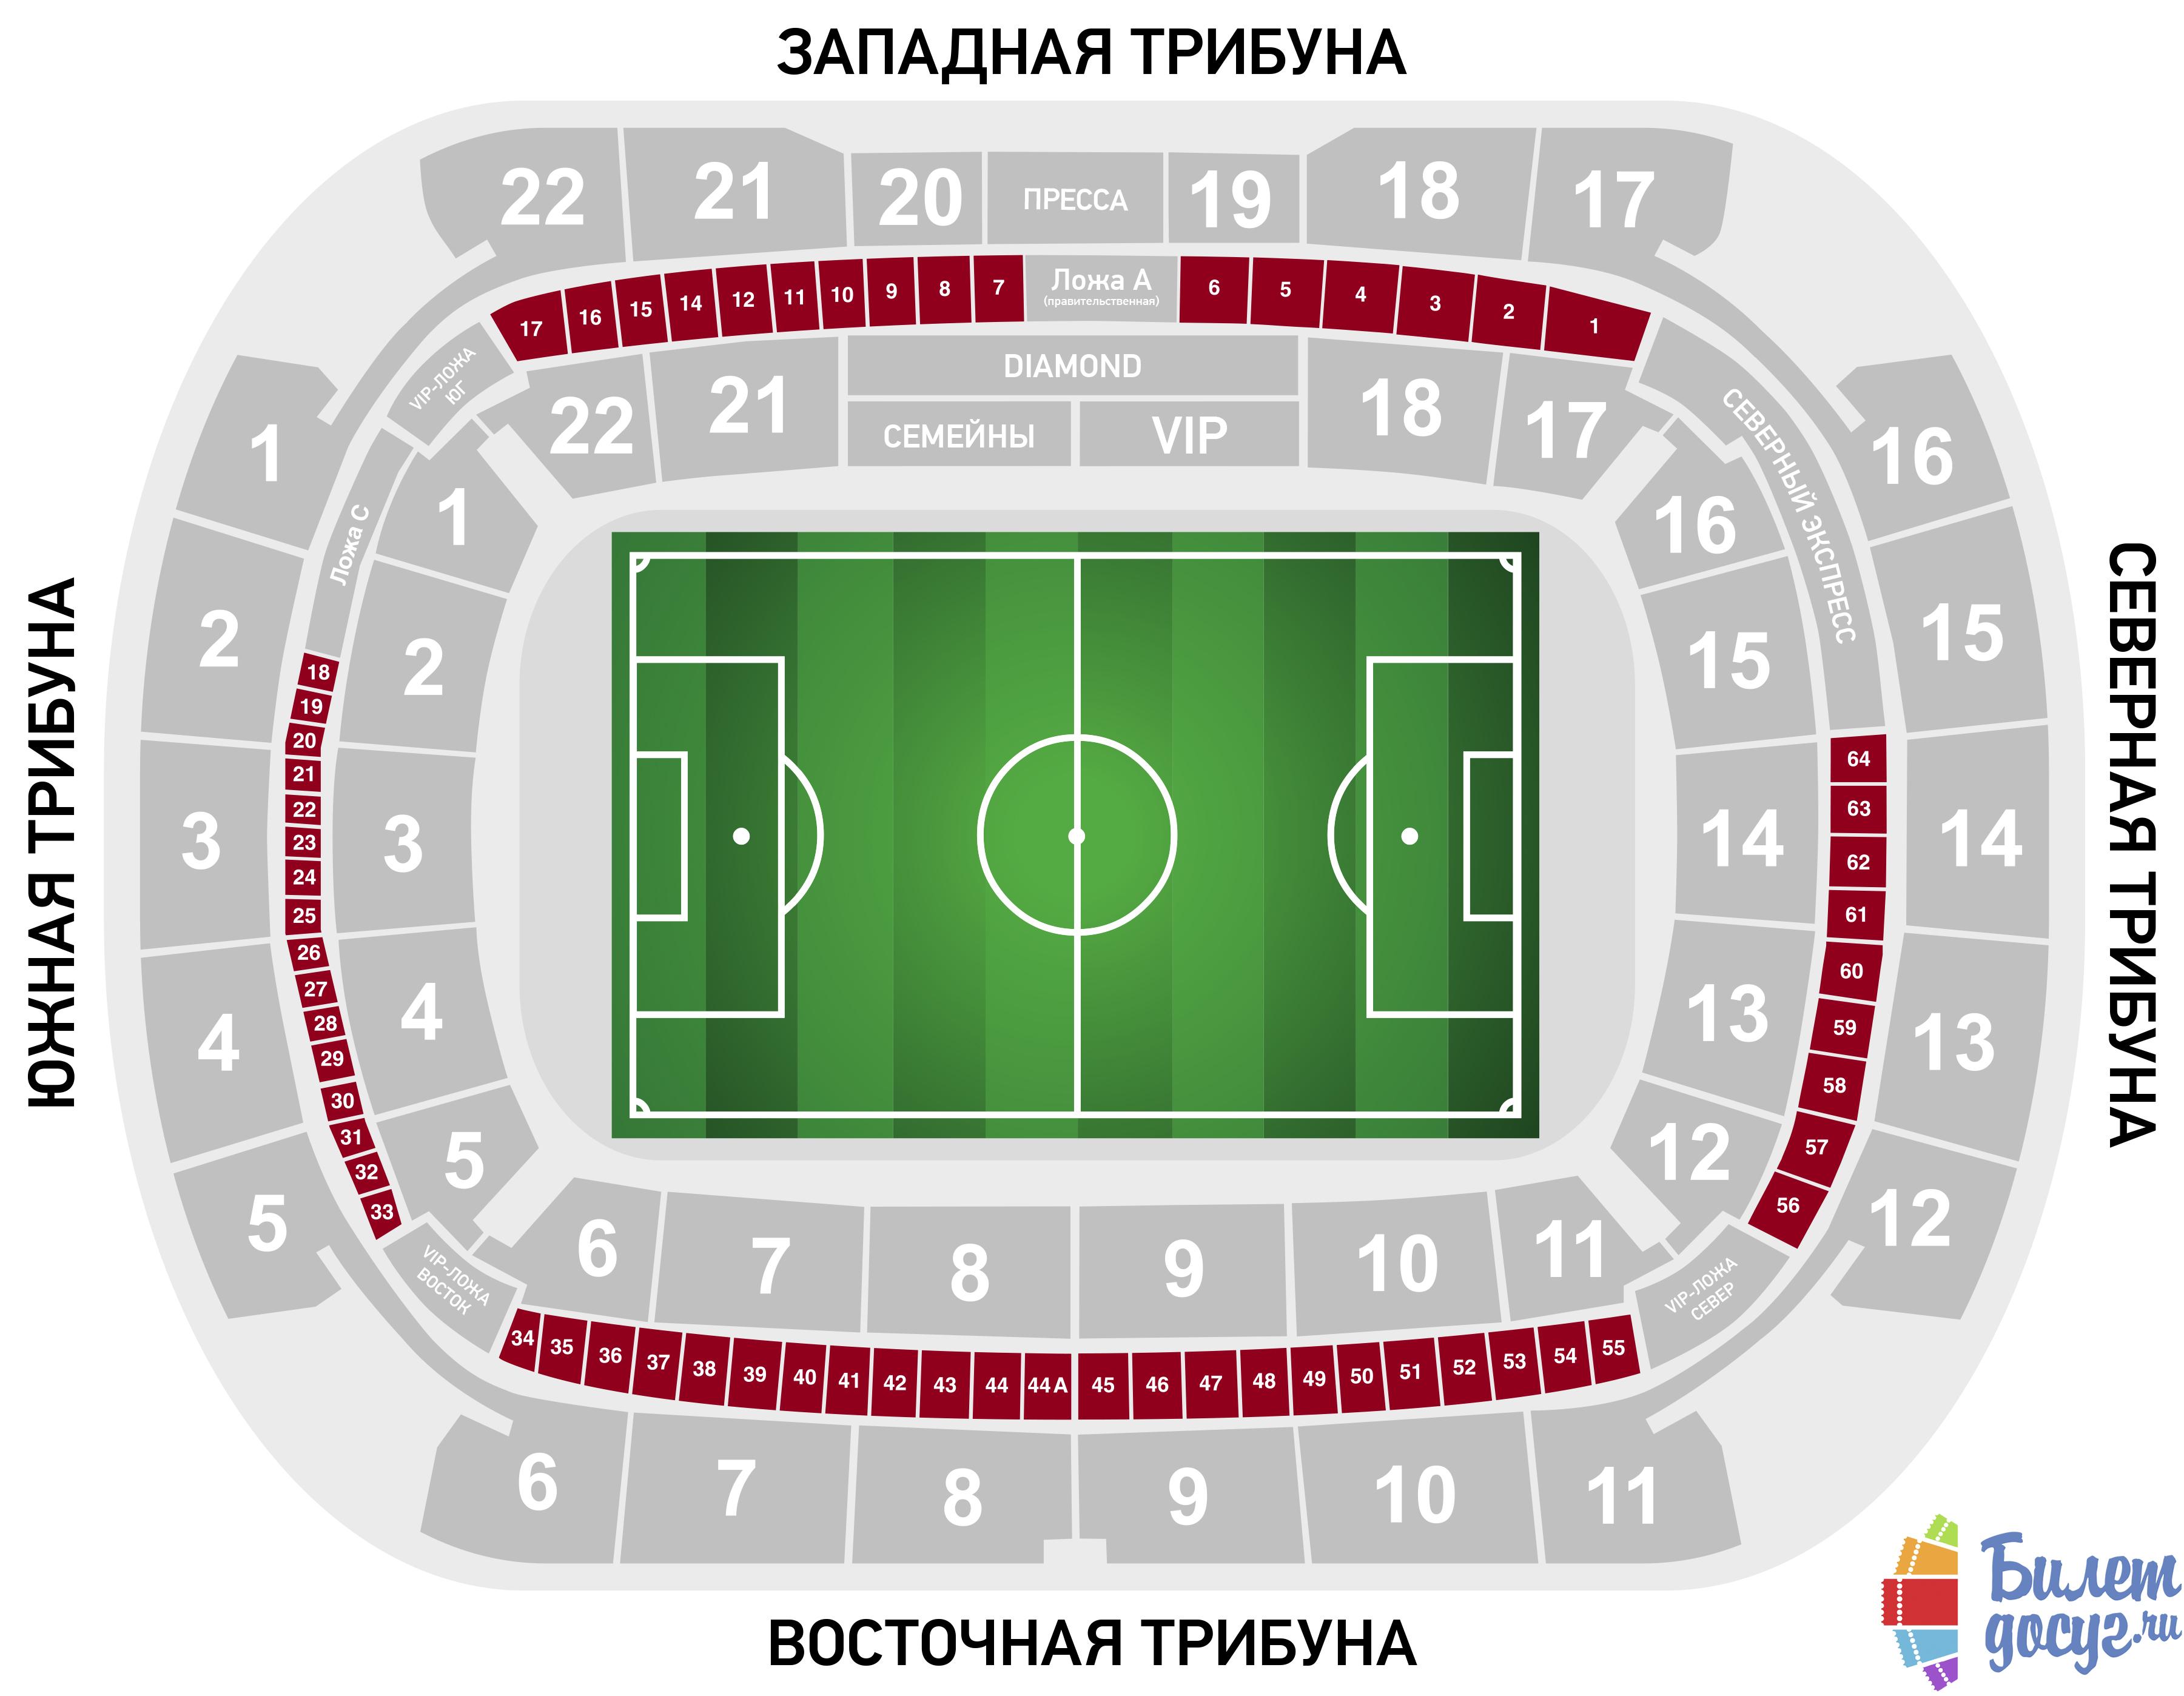 Схема стадион Локомотив